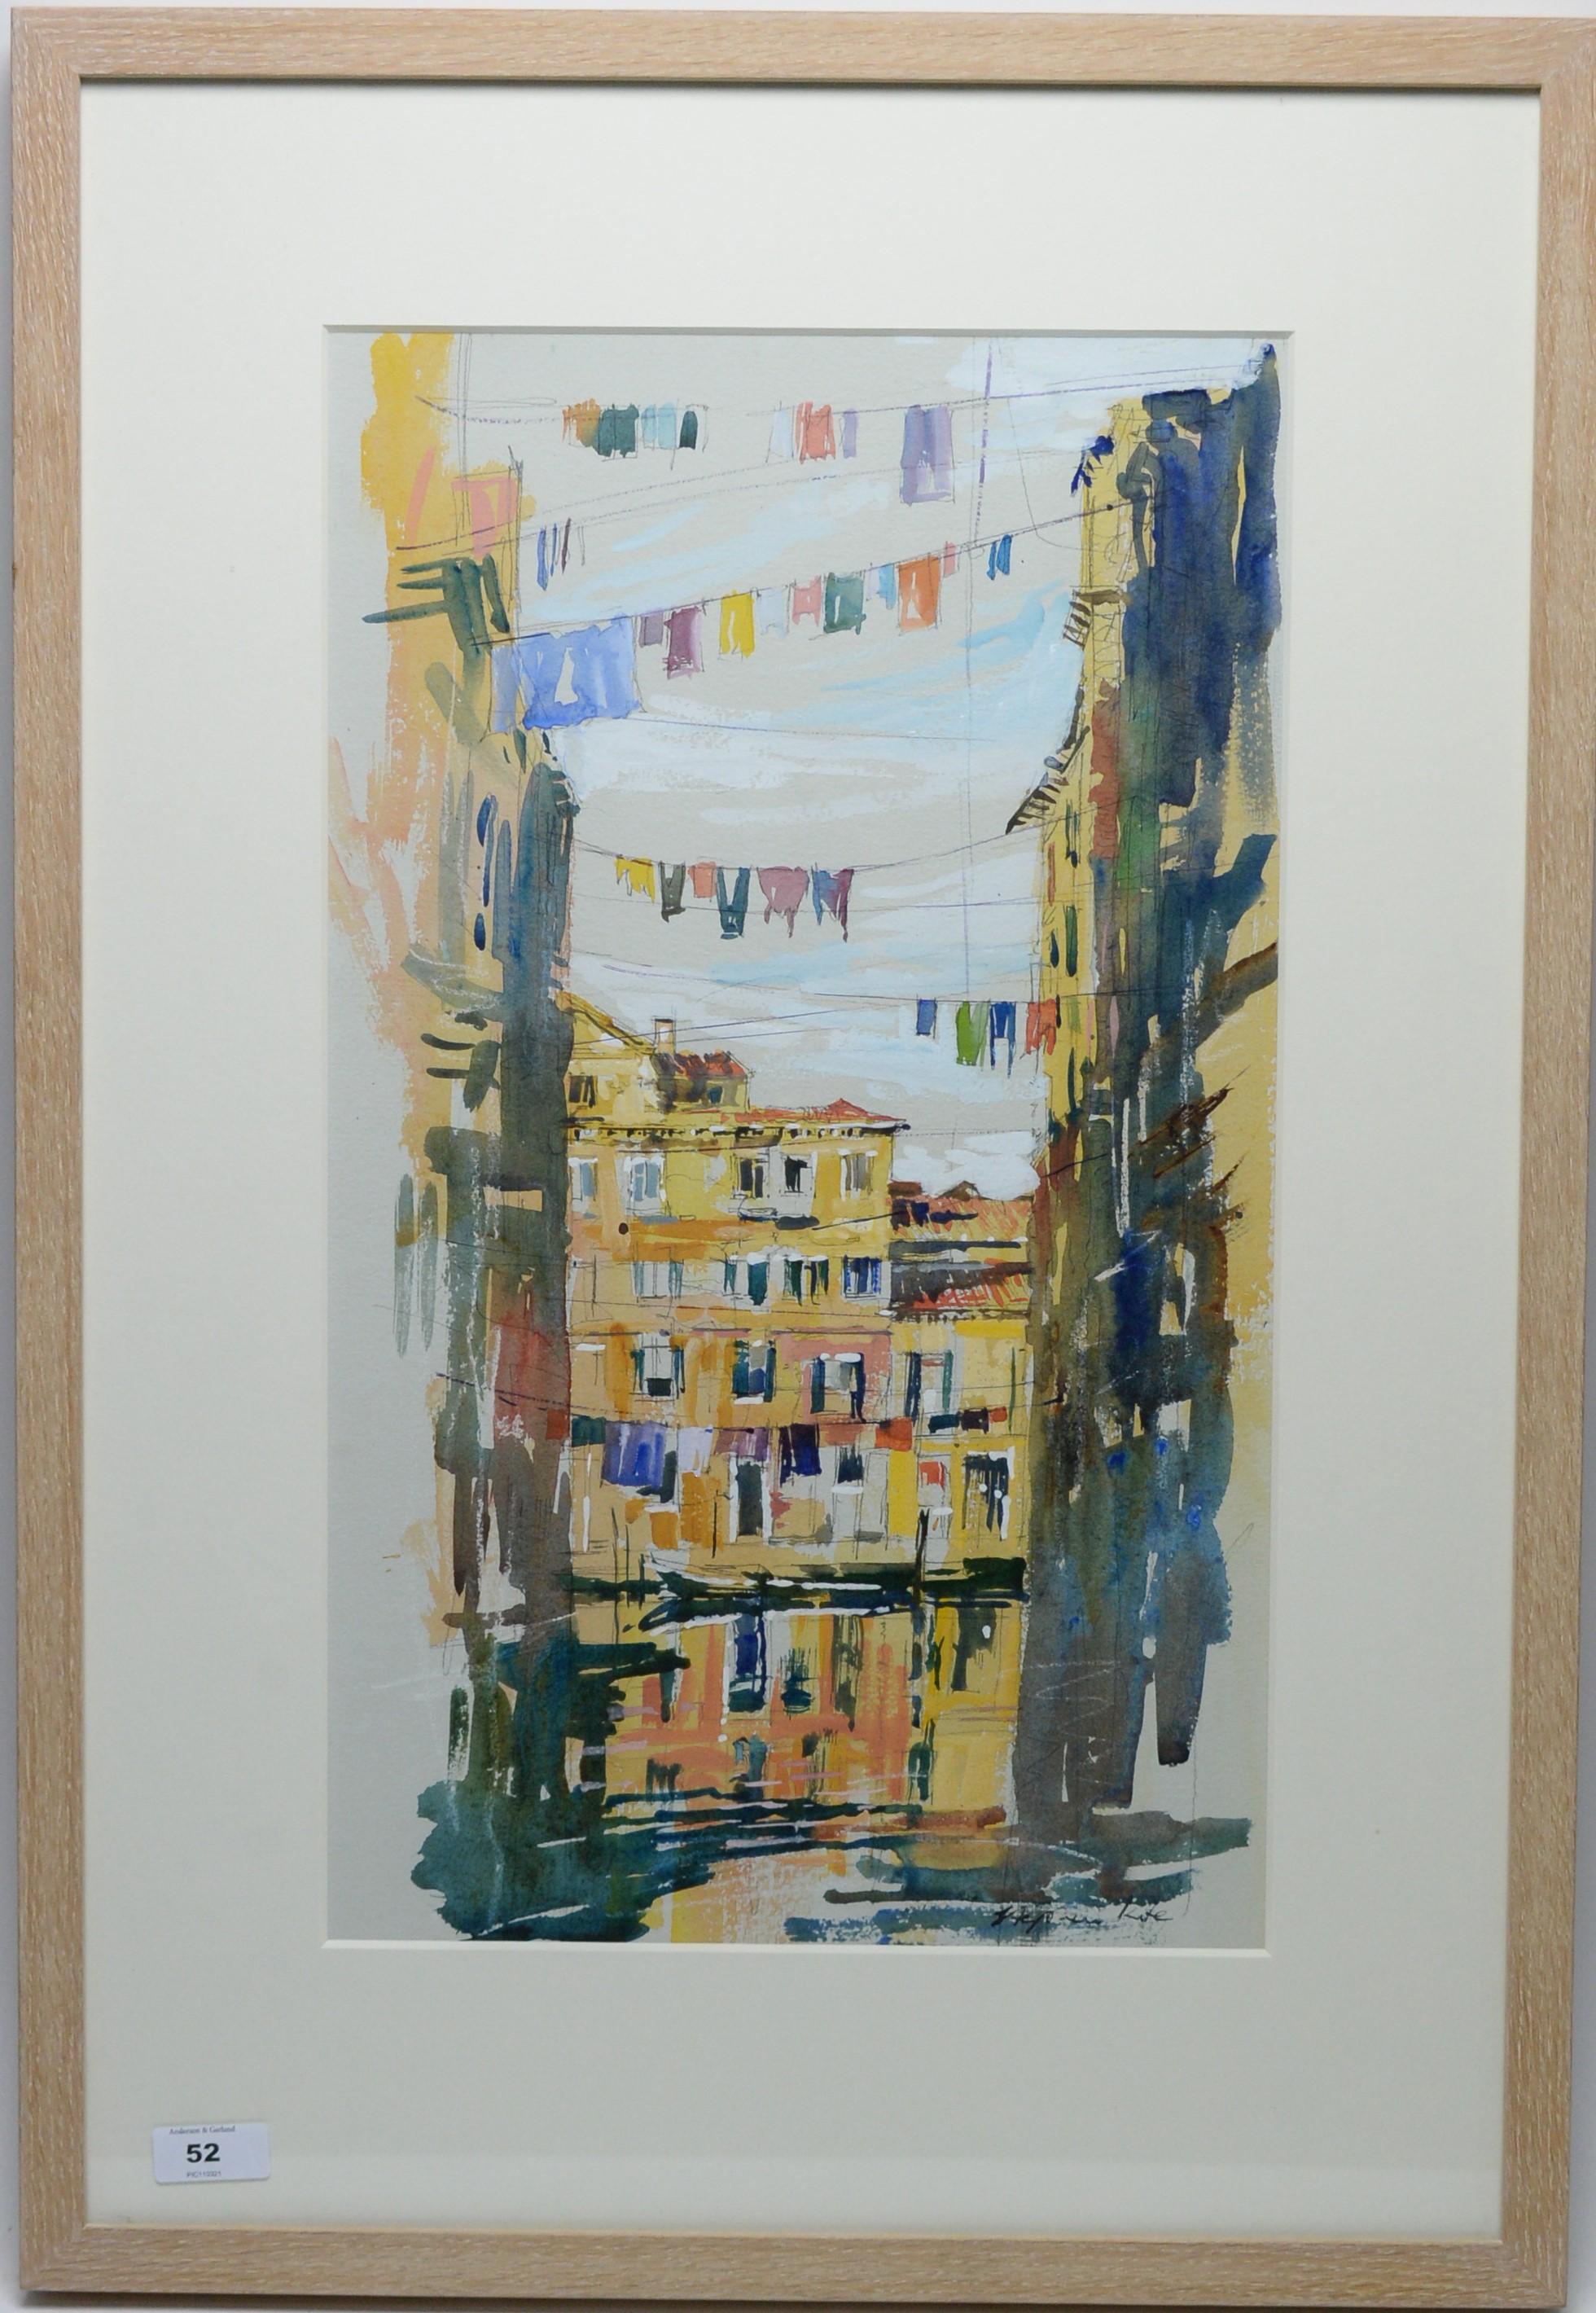 Stephen Kite - watercolour.